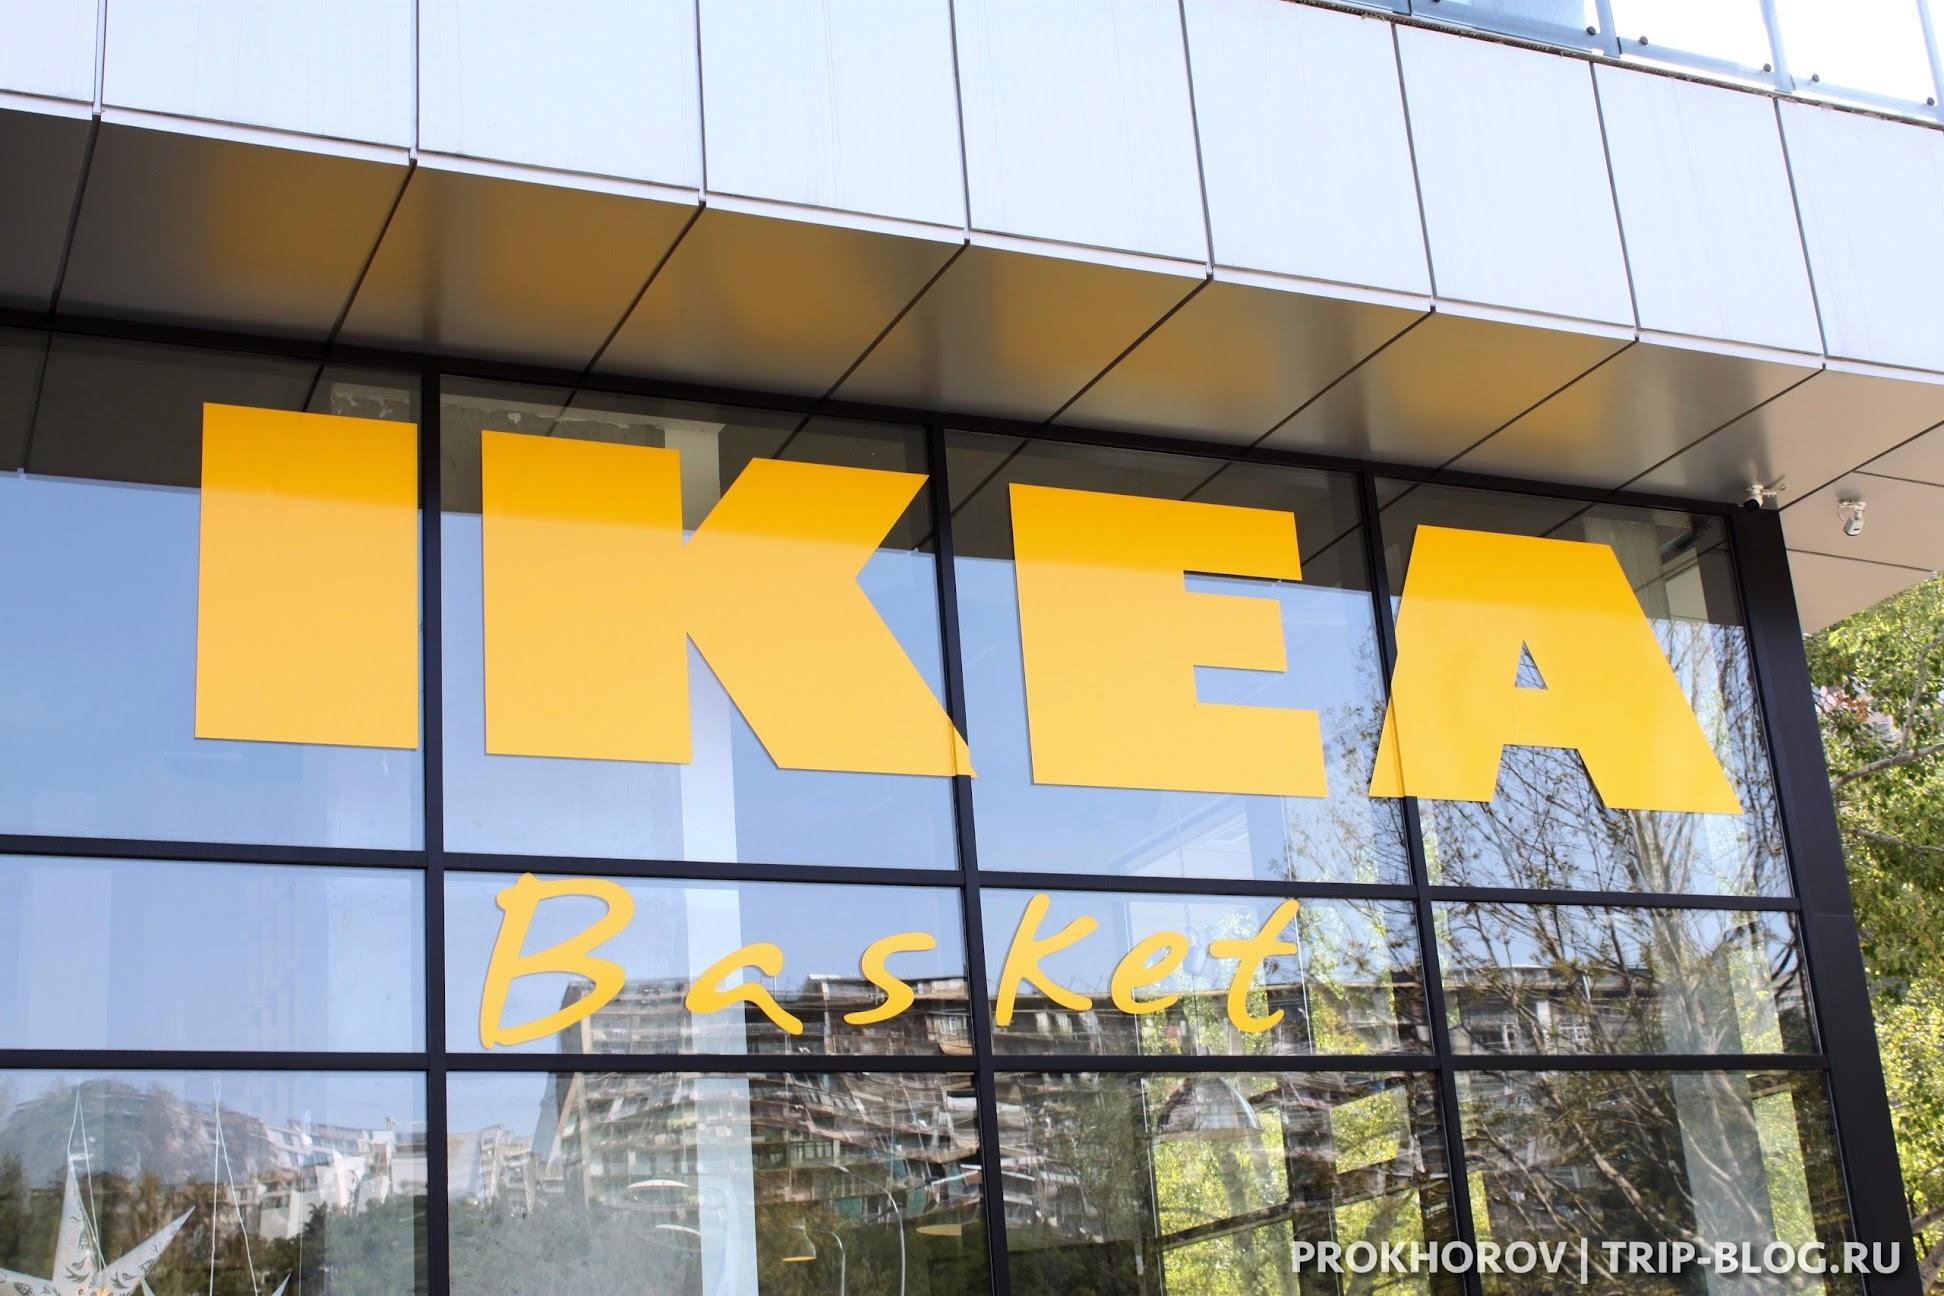 Ikea Georgia